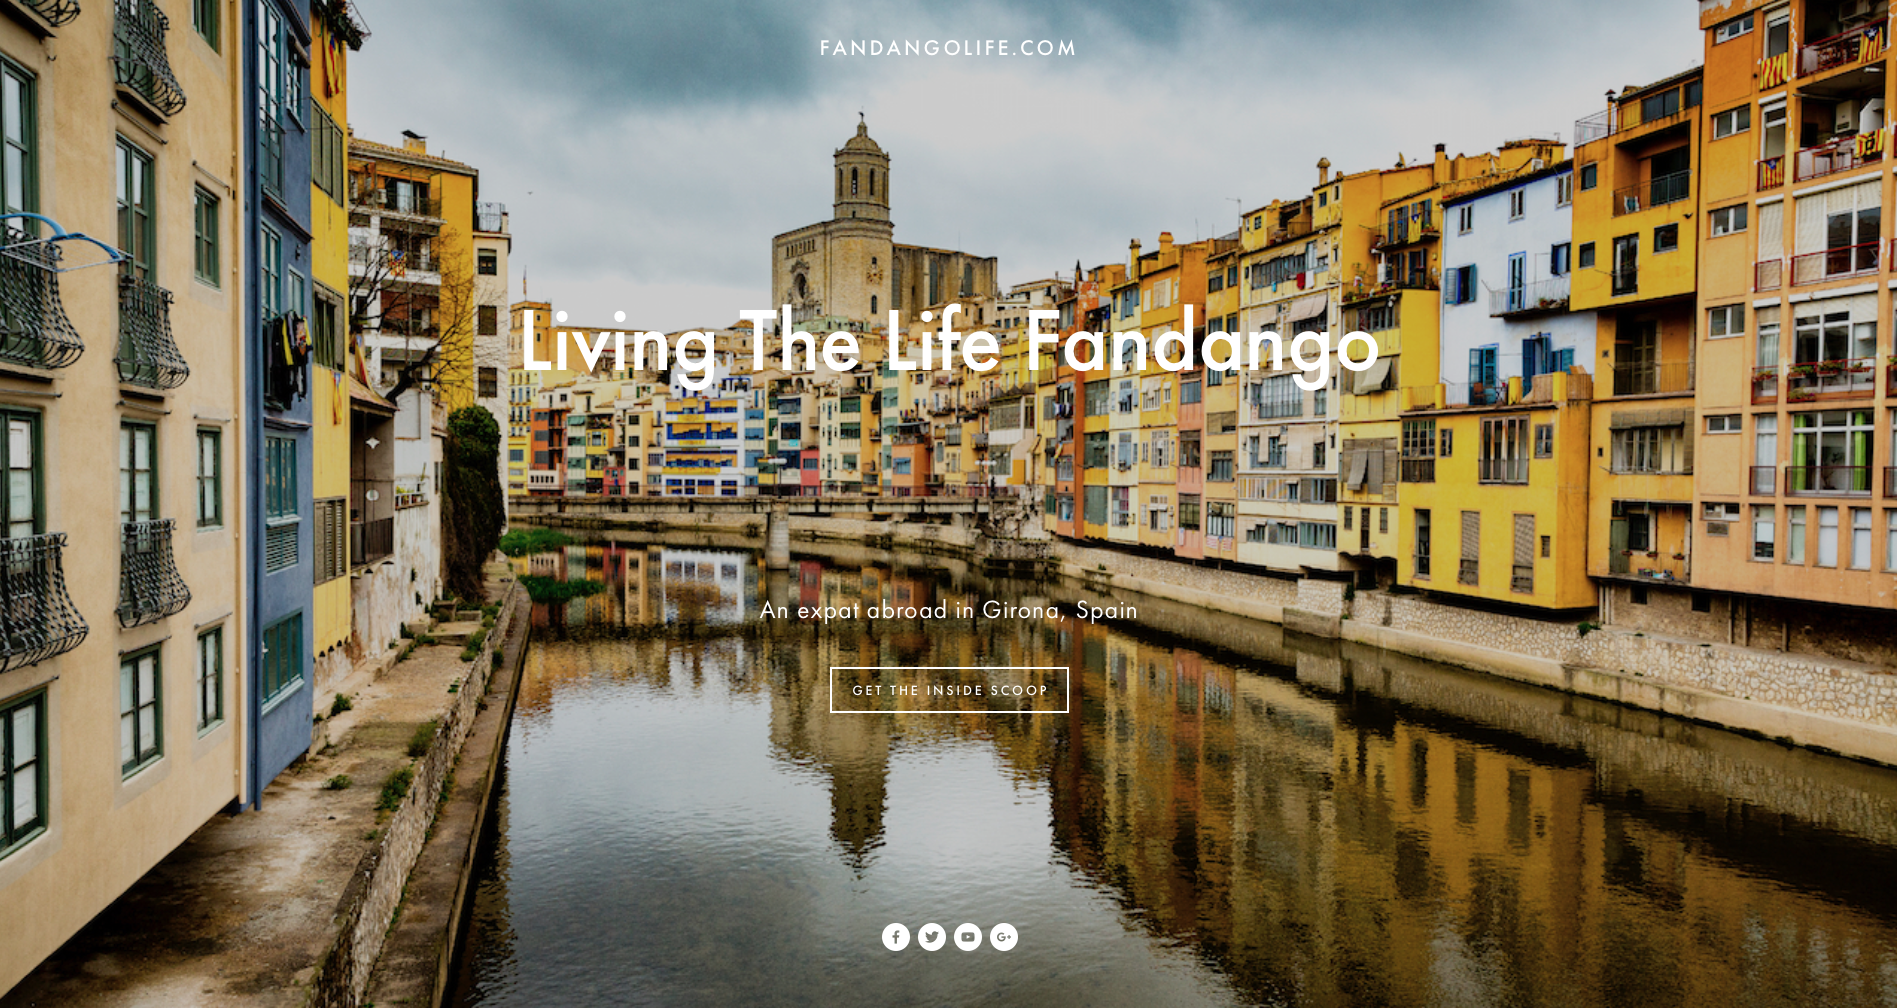 FandangoLife.com